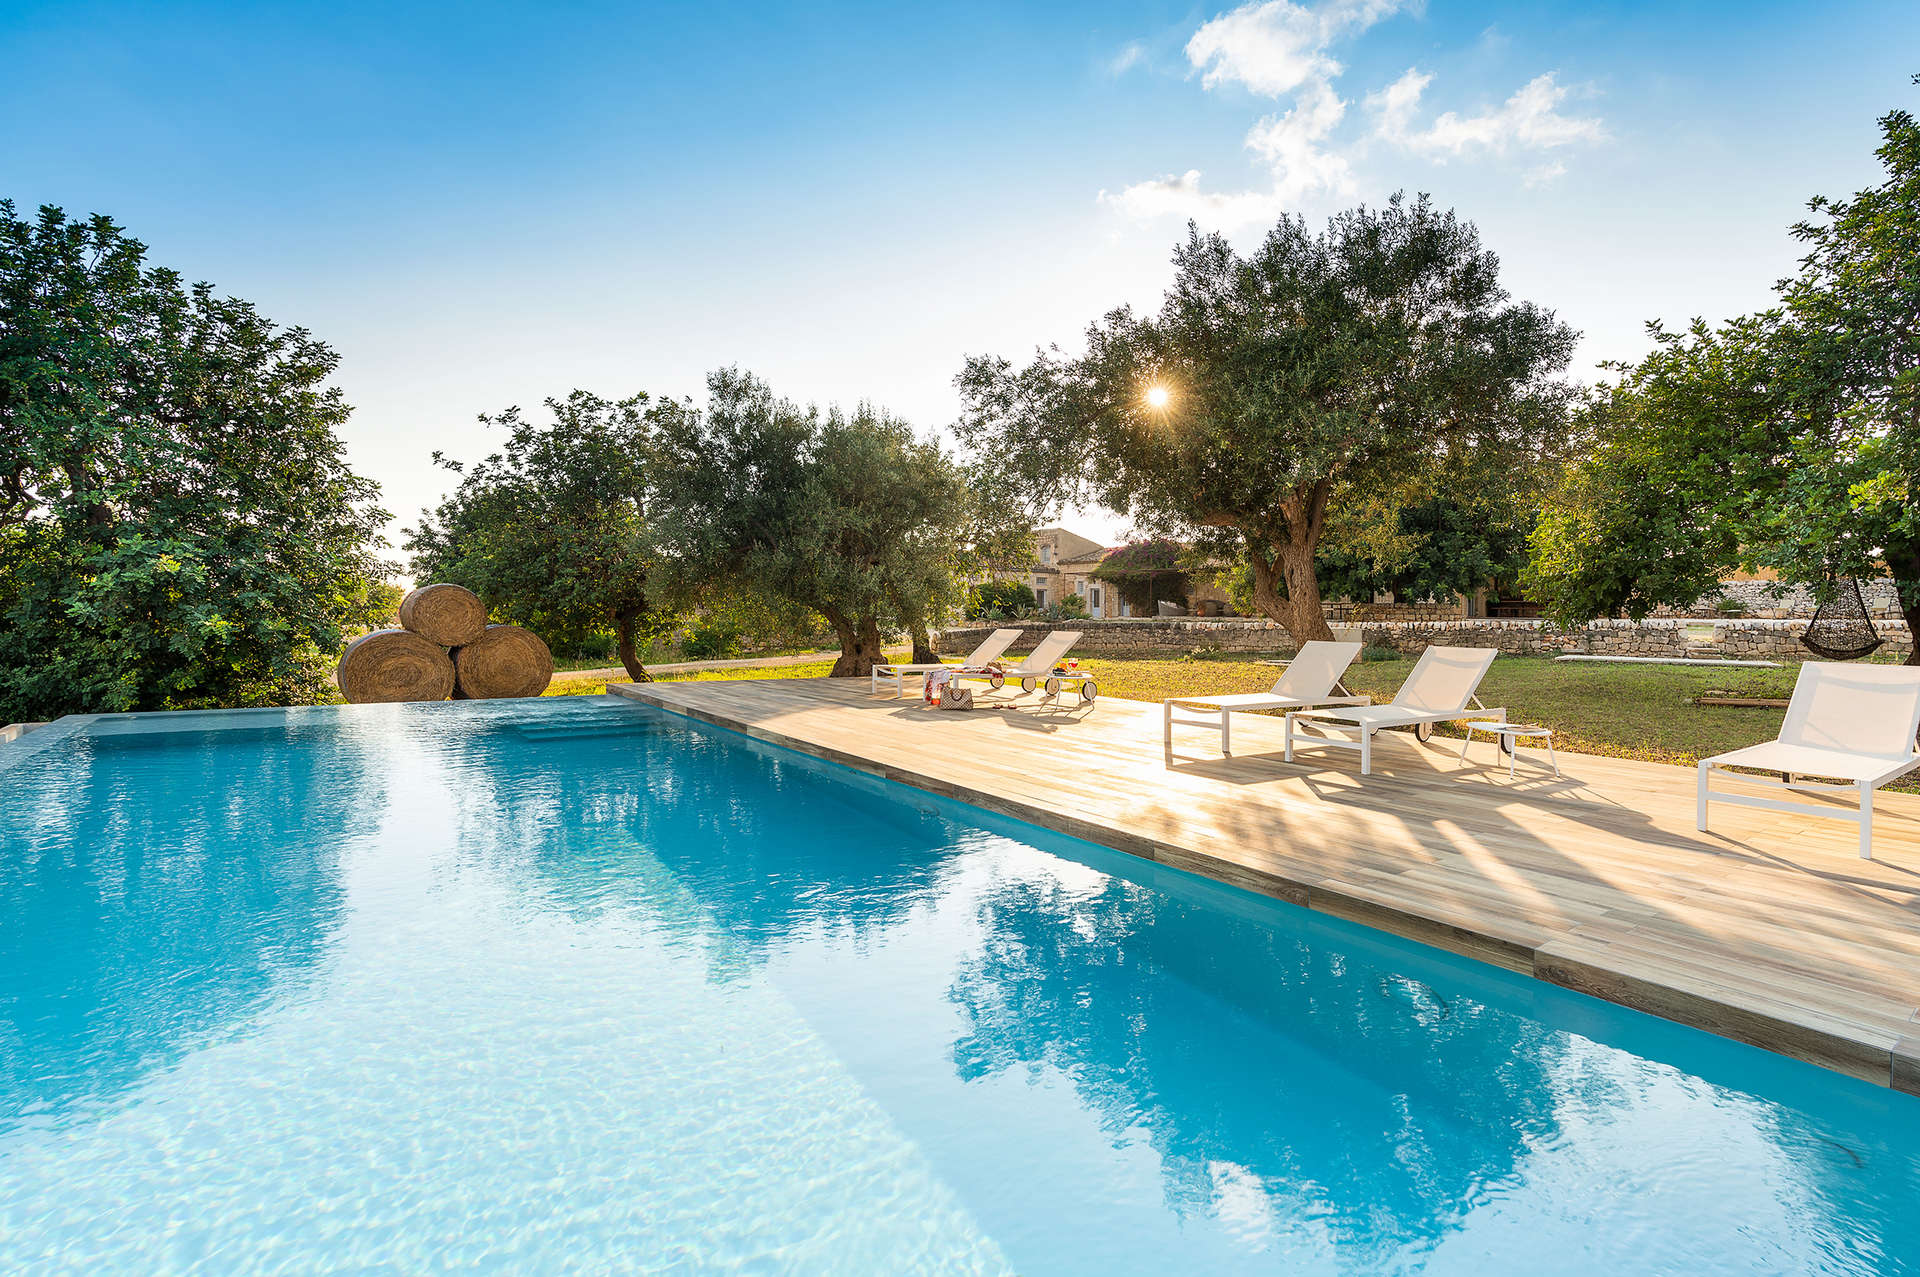 Luxury vacation rentals europe - Italy - Sicily - Scicli - Dimora Pura - Image 1/55